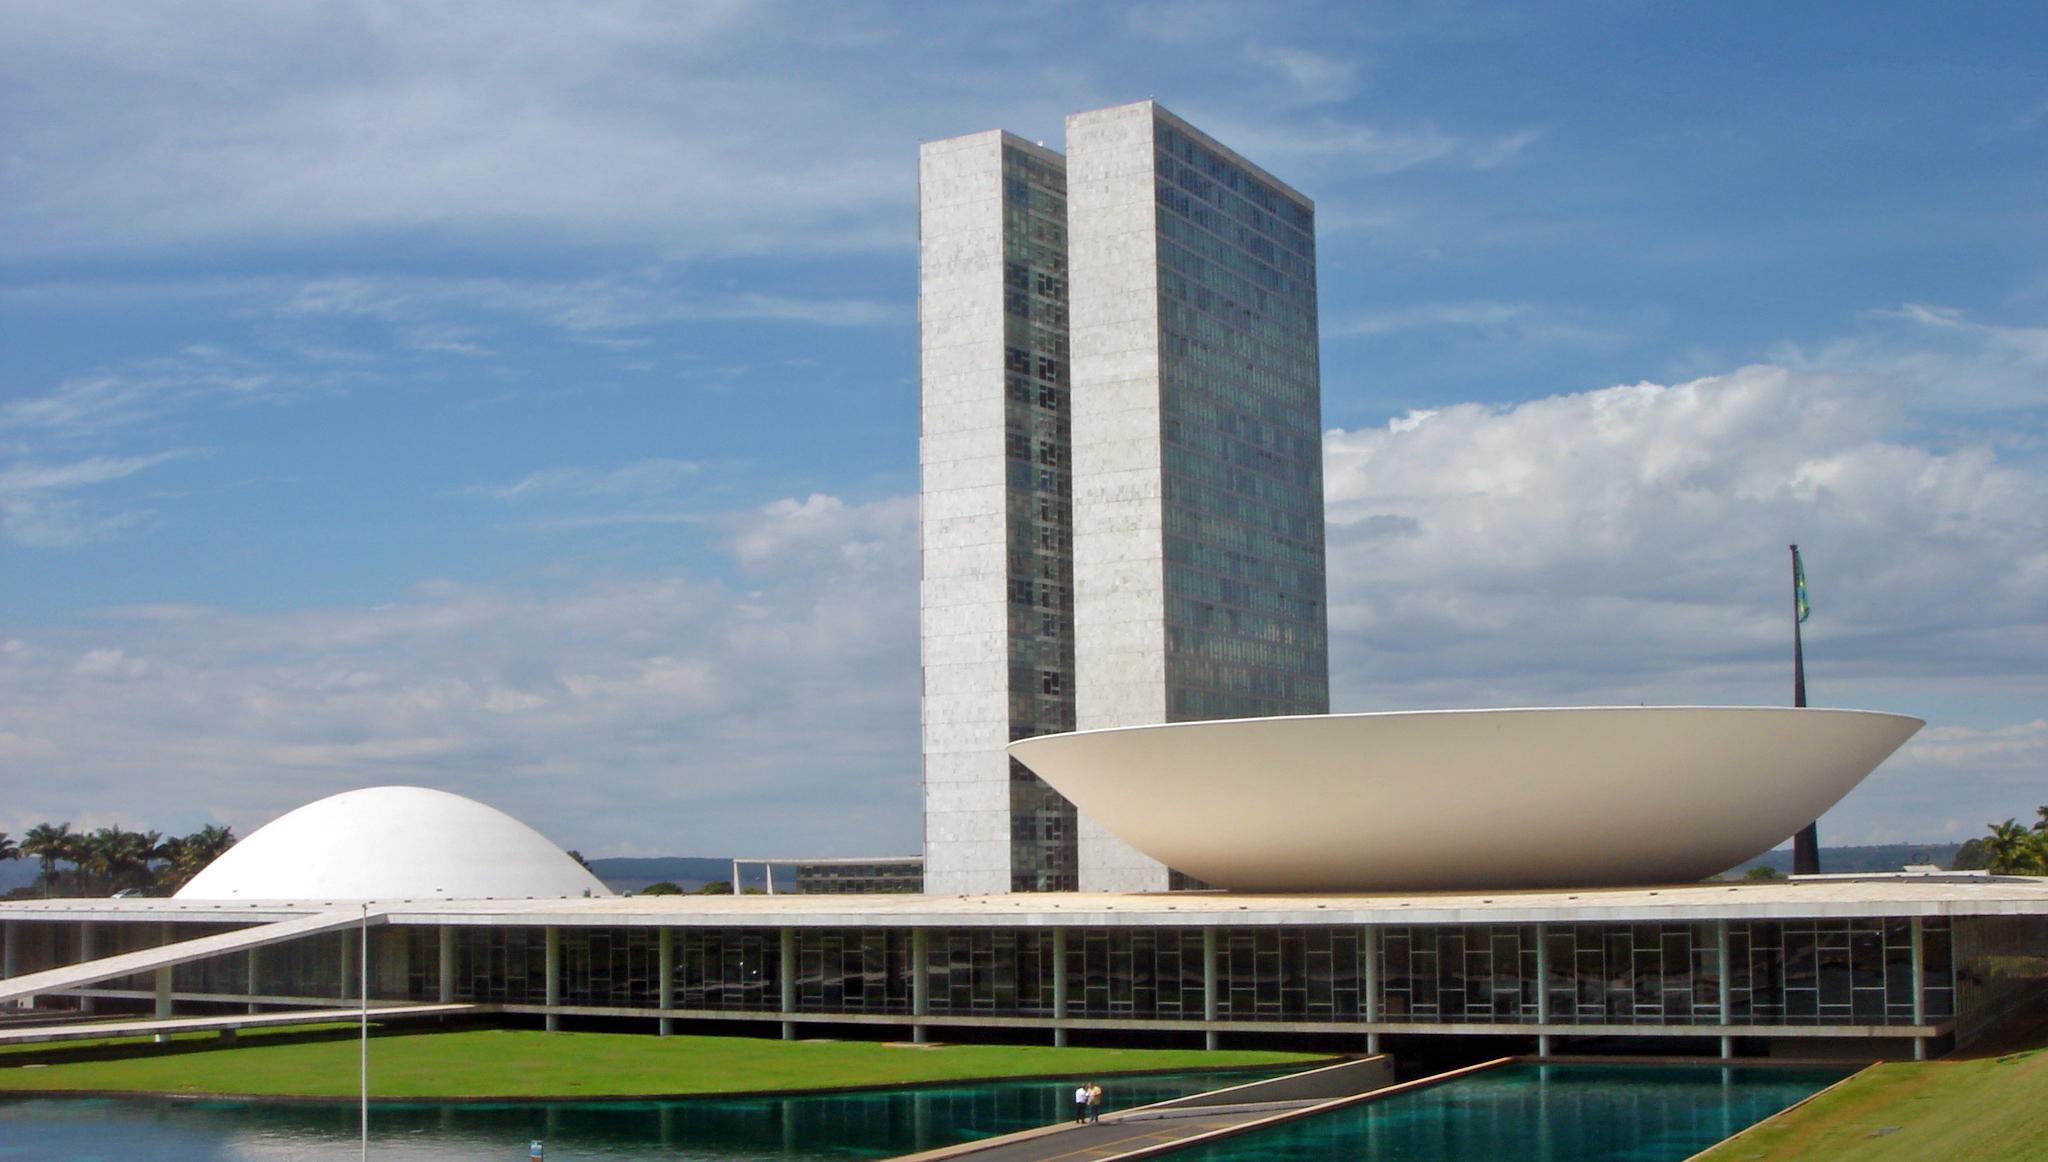 http://upload.wikimedia.org/wikipedia/commons/7/74/Brasilia_Congresso_Nacional_05_2007_221.jpg